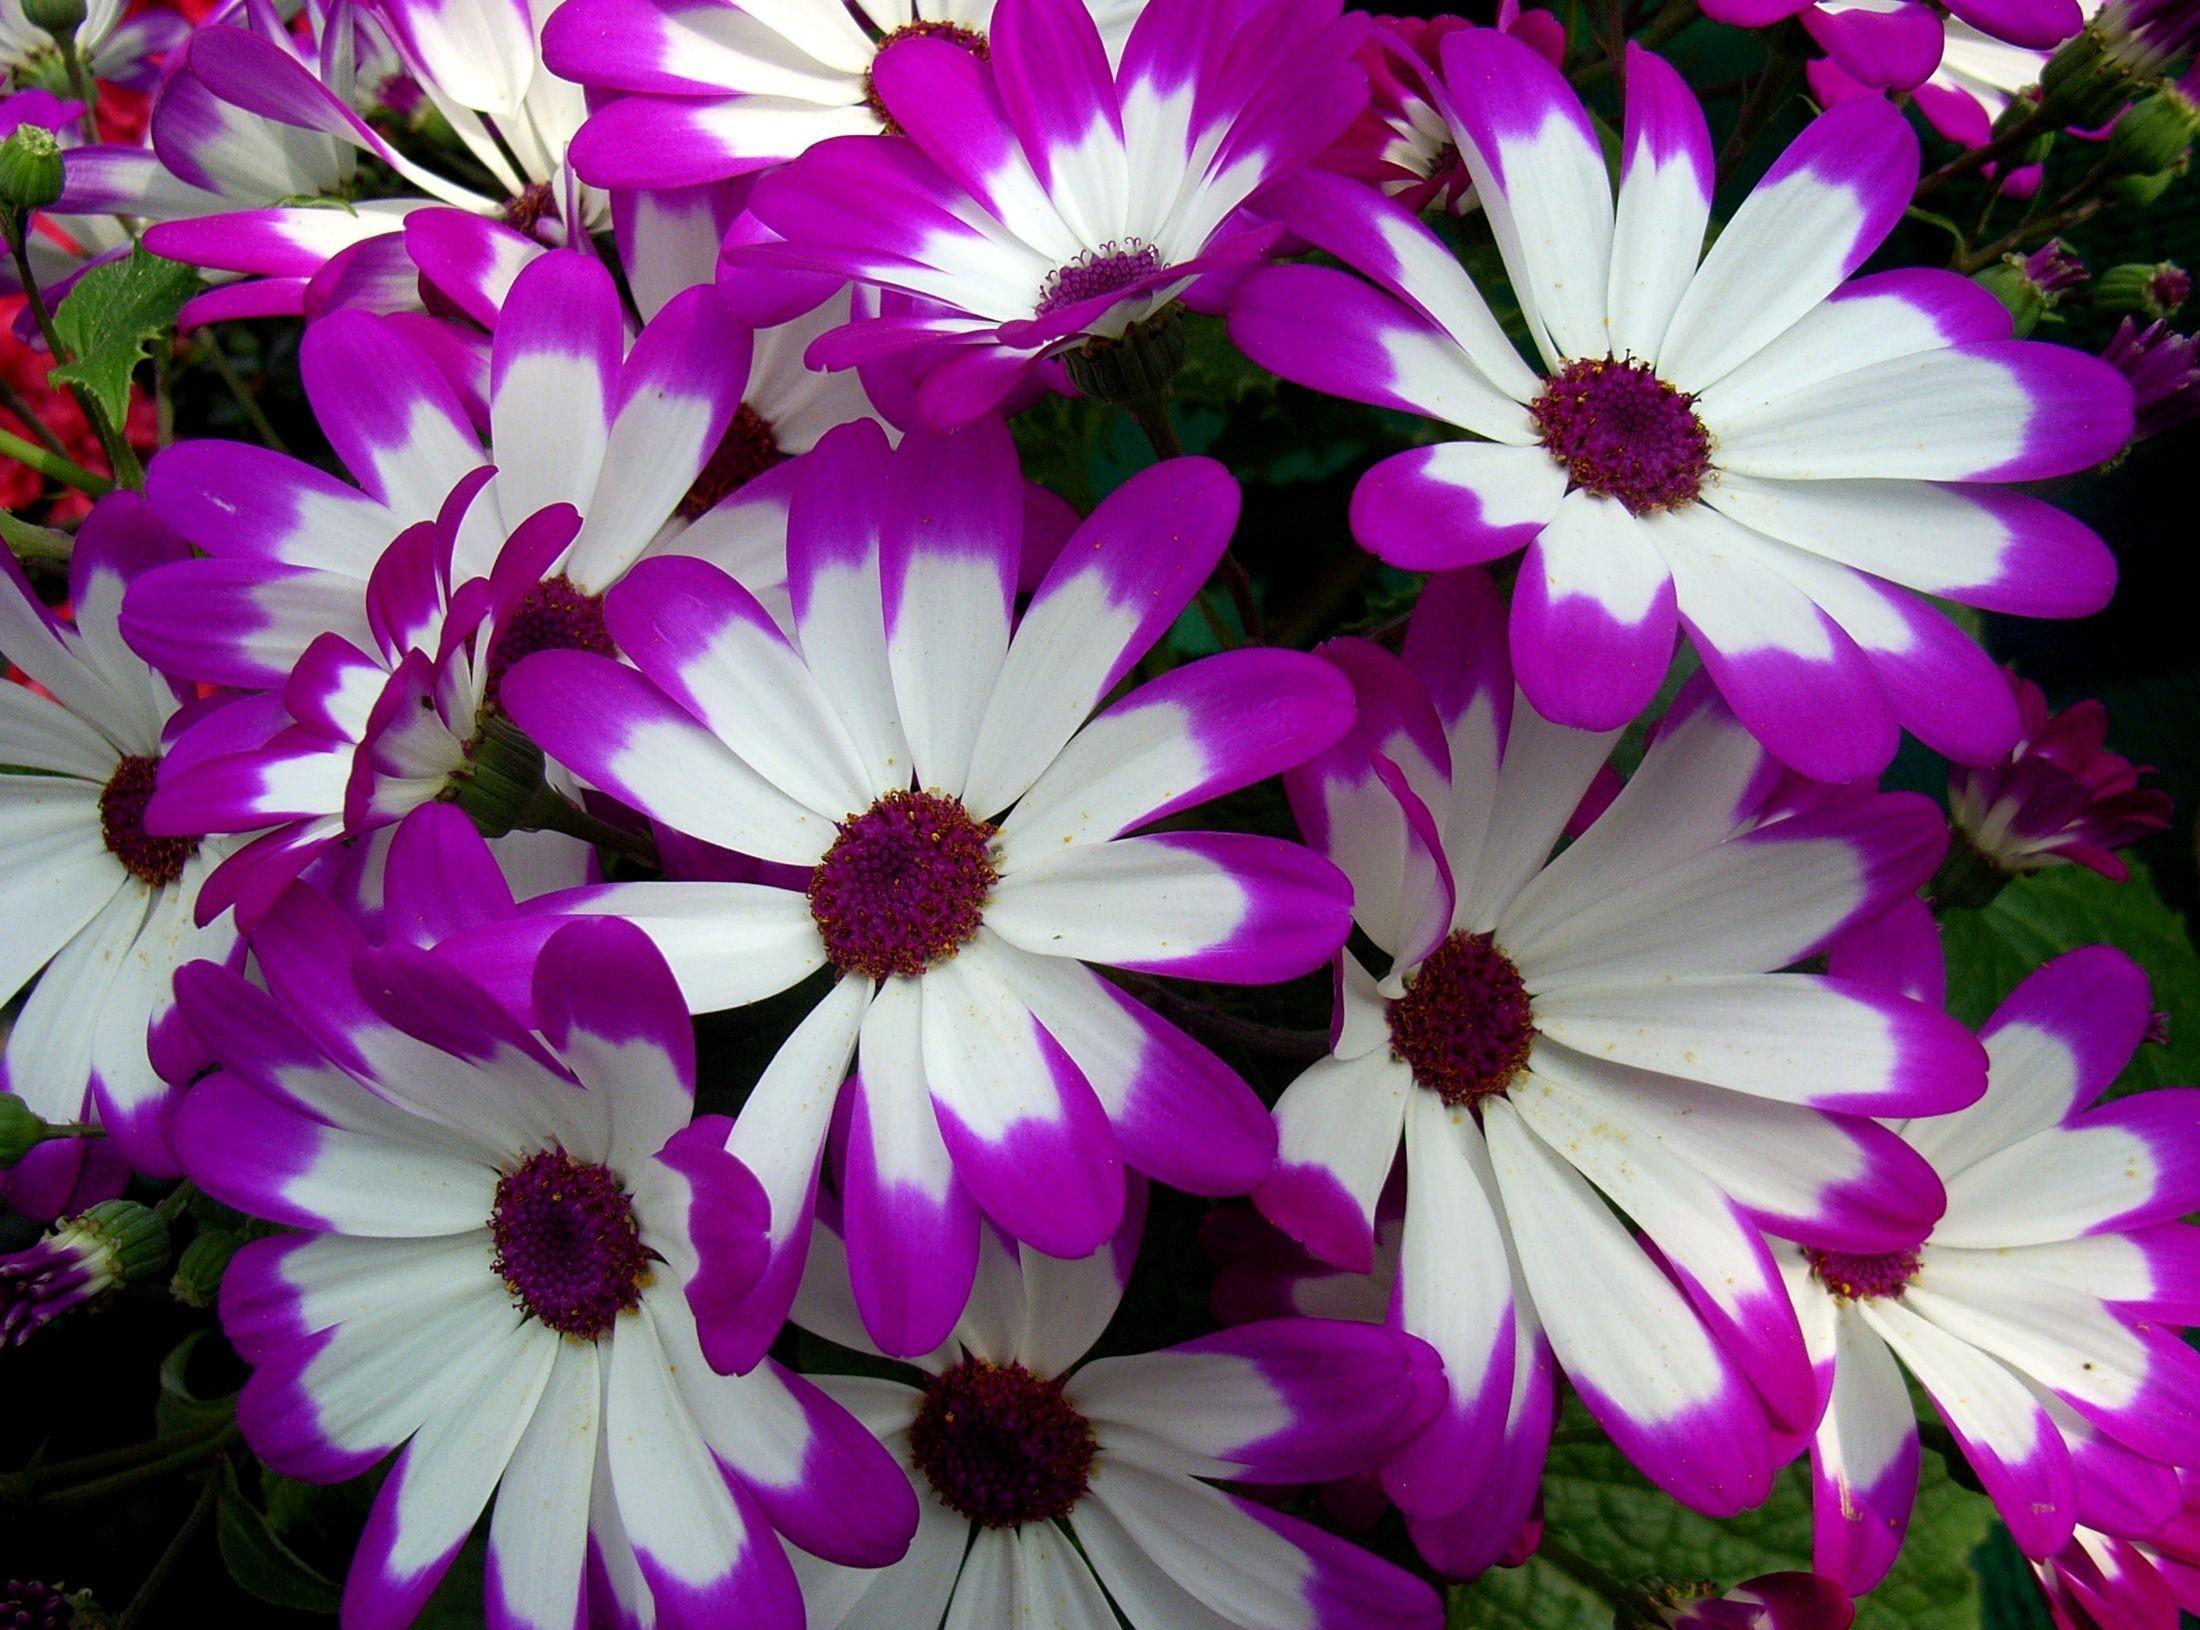 Фото цветов найдено в картинках